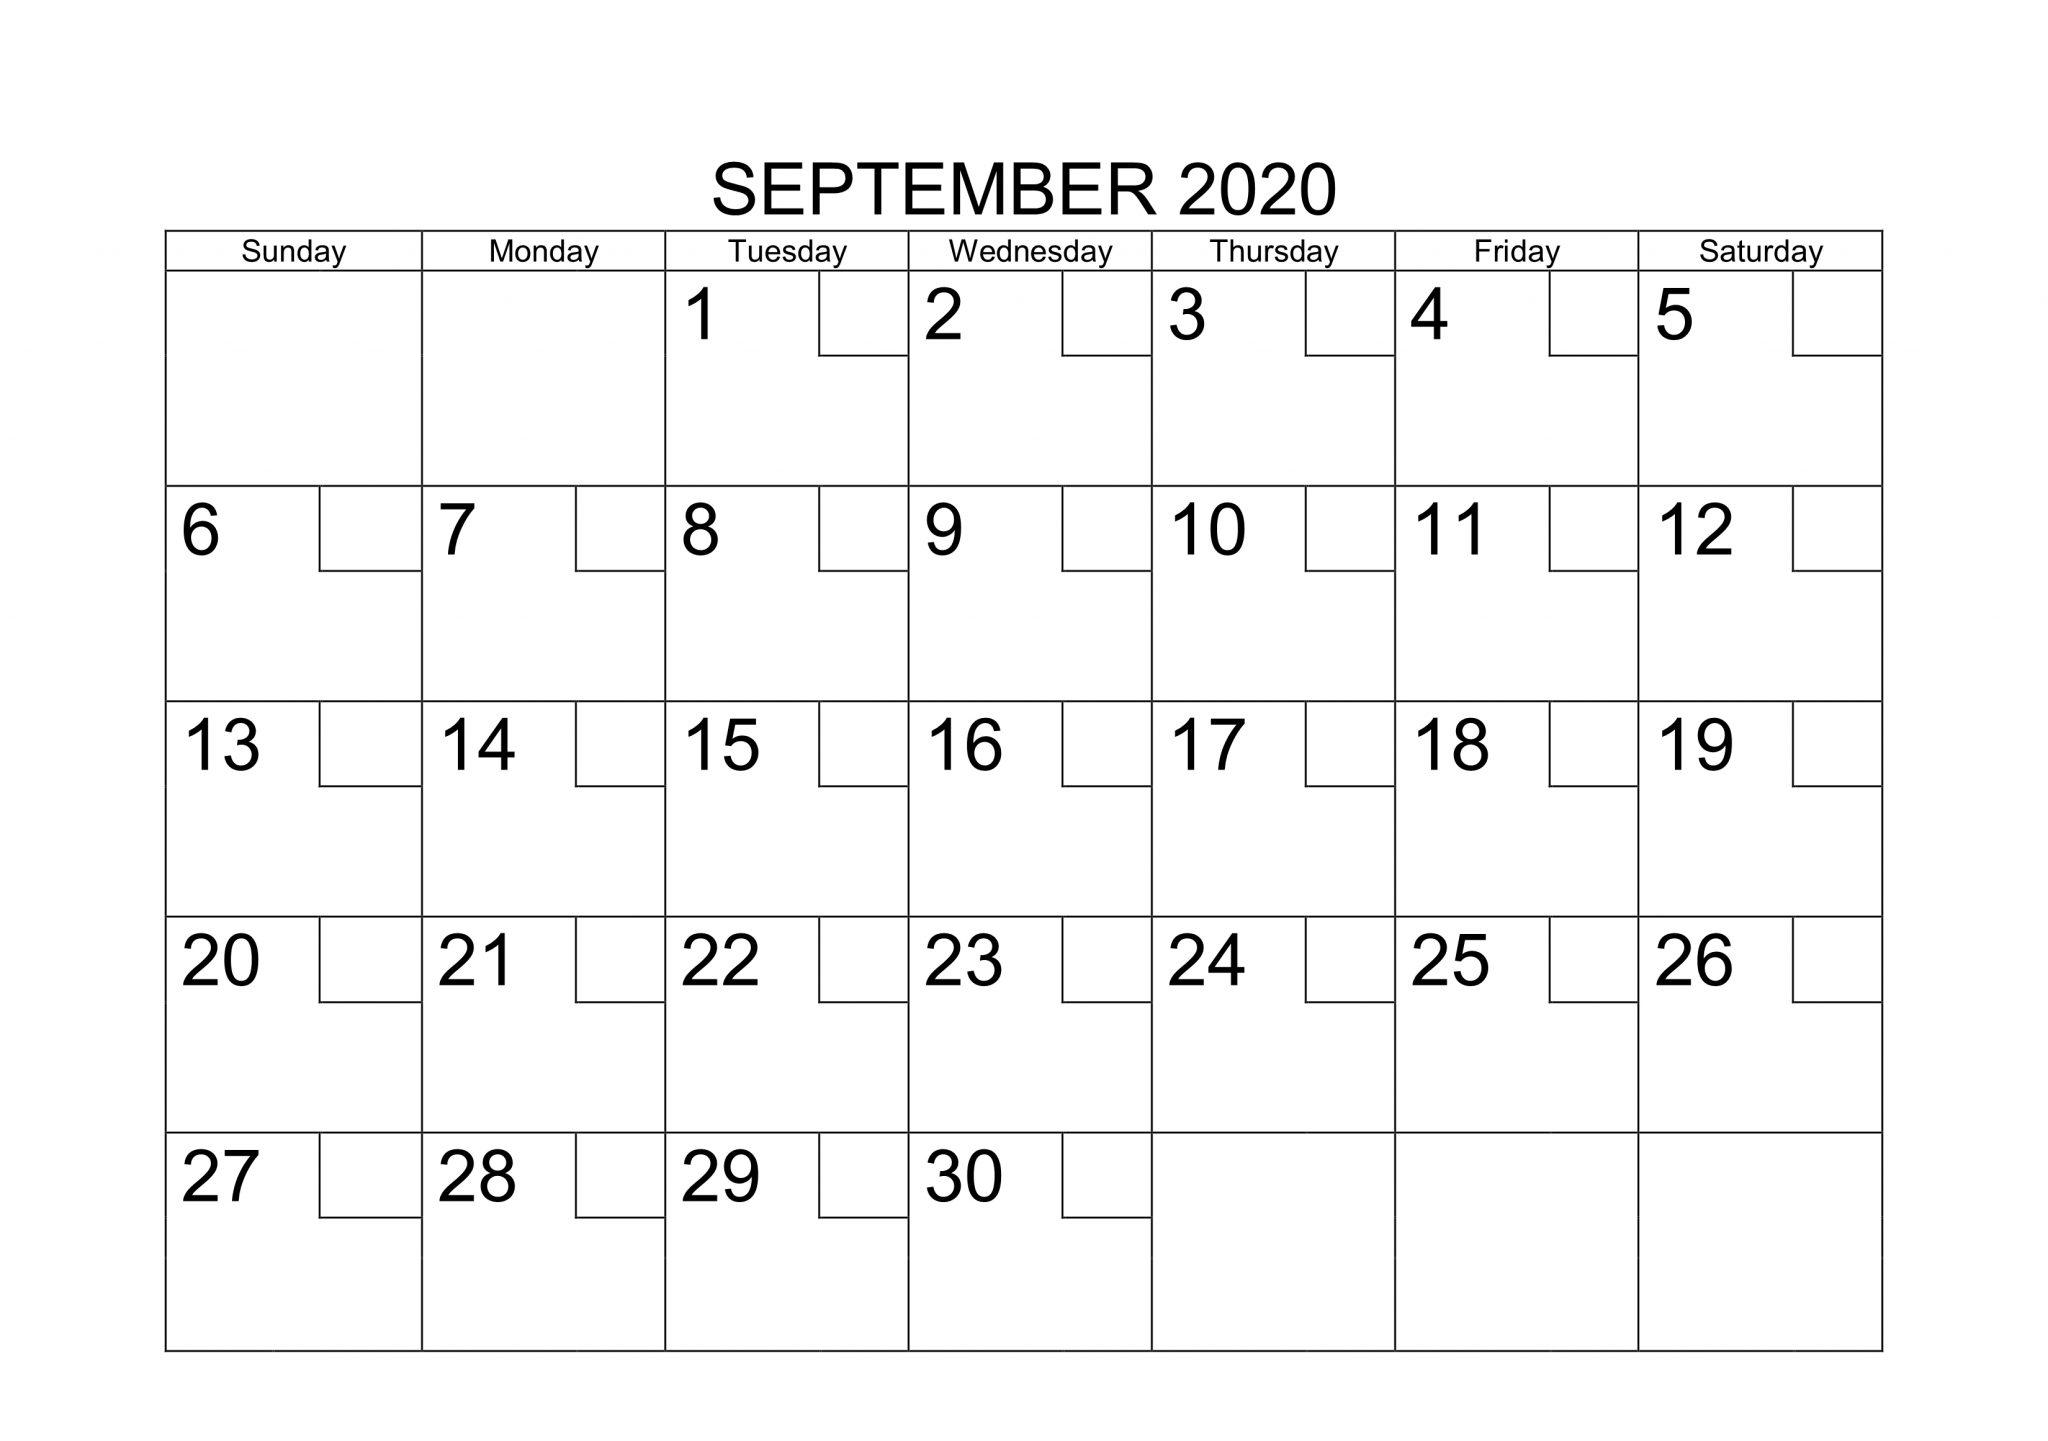 Decorative September 2020 Calendar